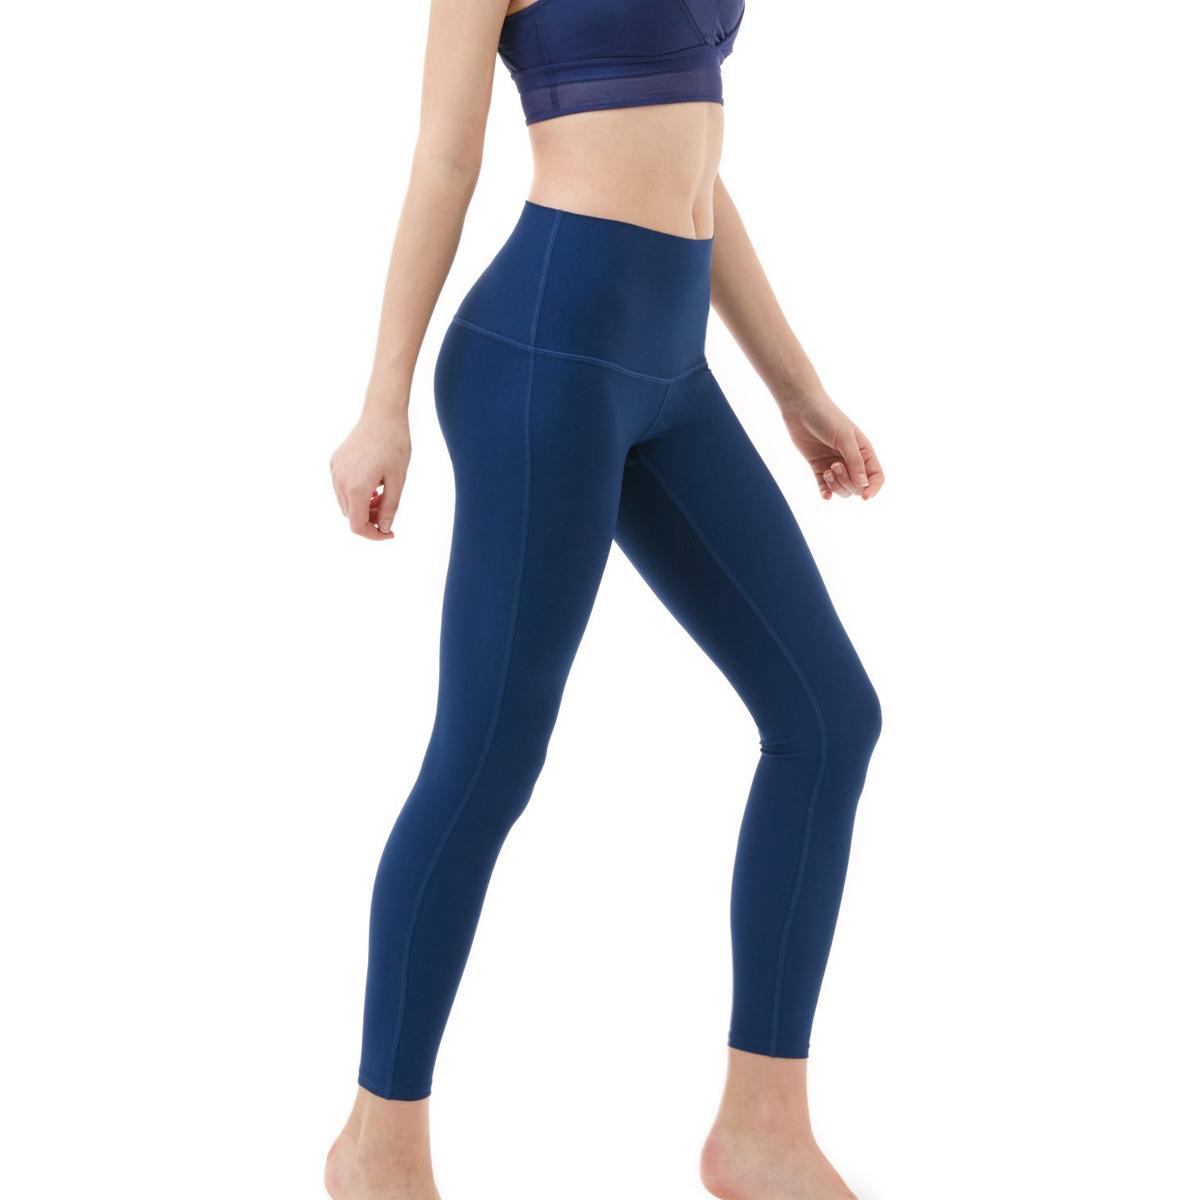 thumbnail 43 - TSLA Tesla FYP42 Women's High-Waisted Ultra-Stretch Tummy Control Yoga Pants